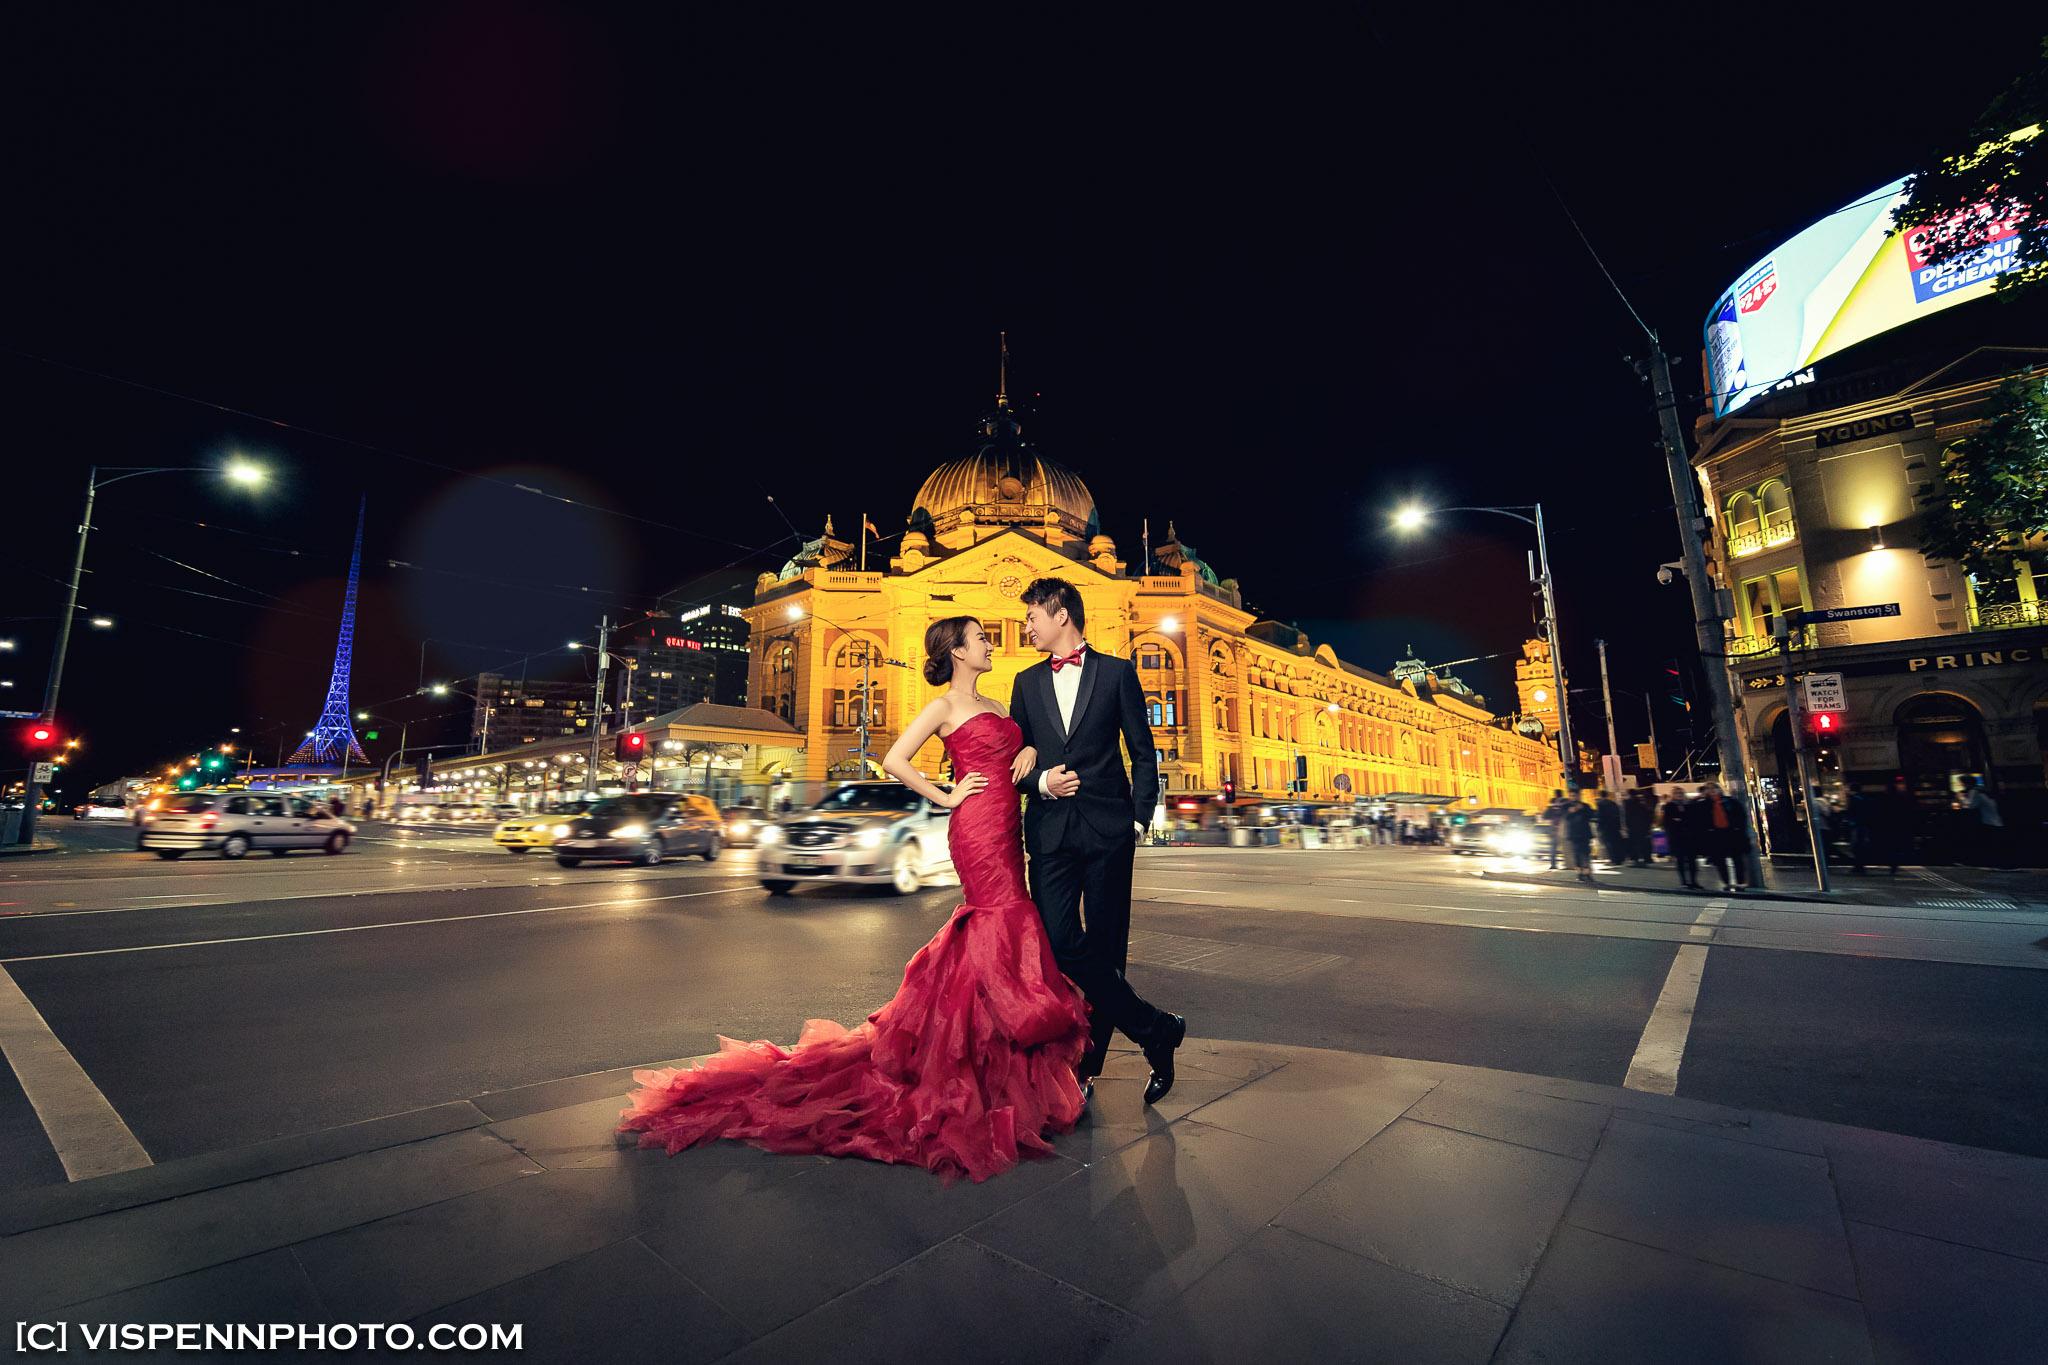 PRE WEDDING Photography Melbourne VISPENN 墨尔本 婚纱照 结婚照 婚纱摄影 VISPENN EkaPreWedding 3405